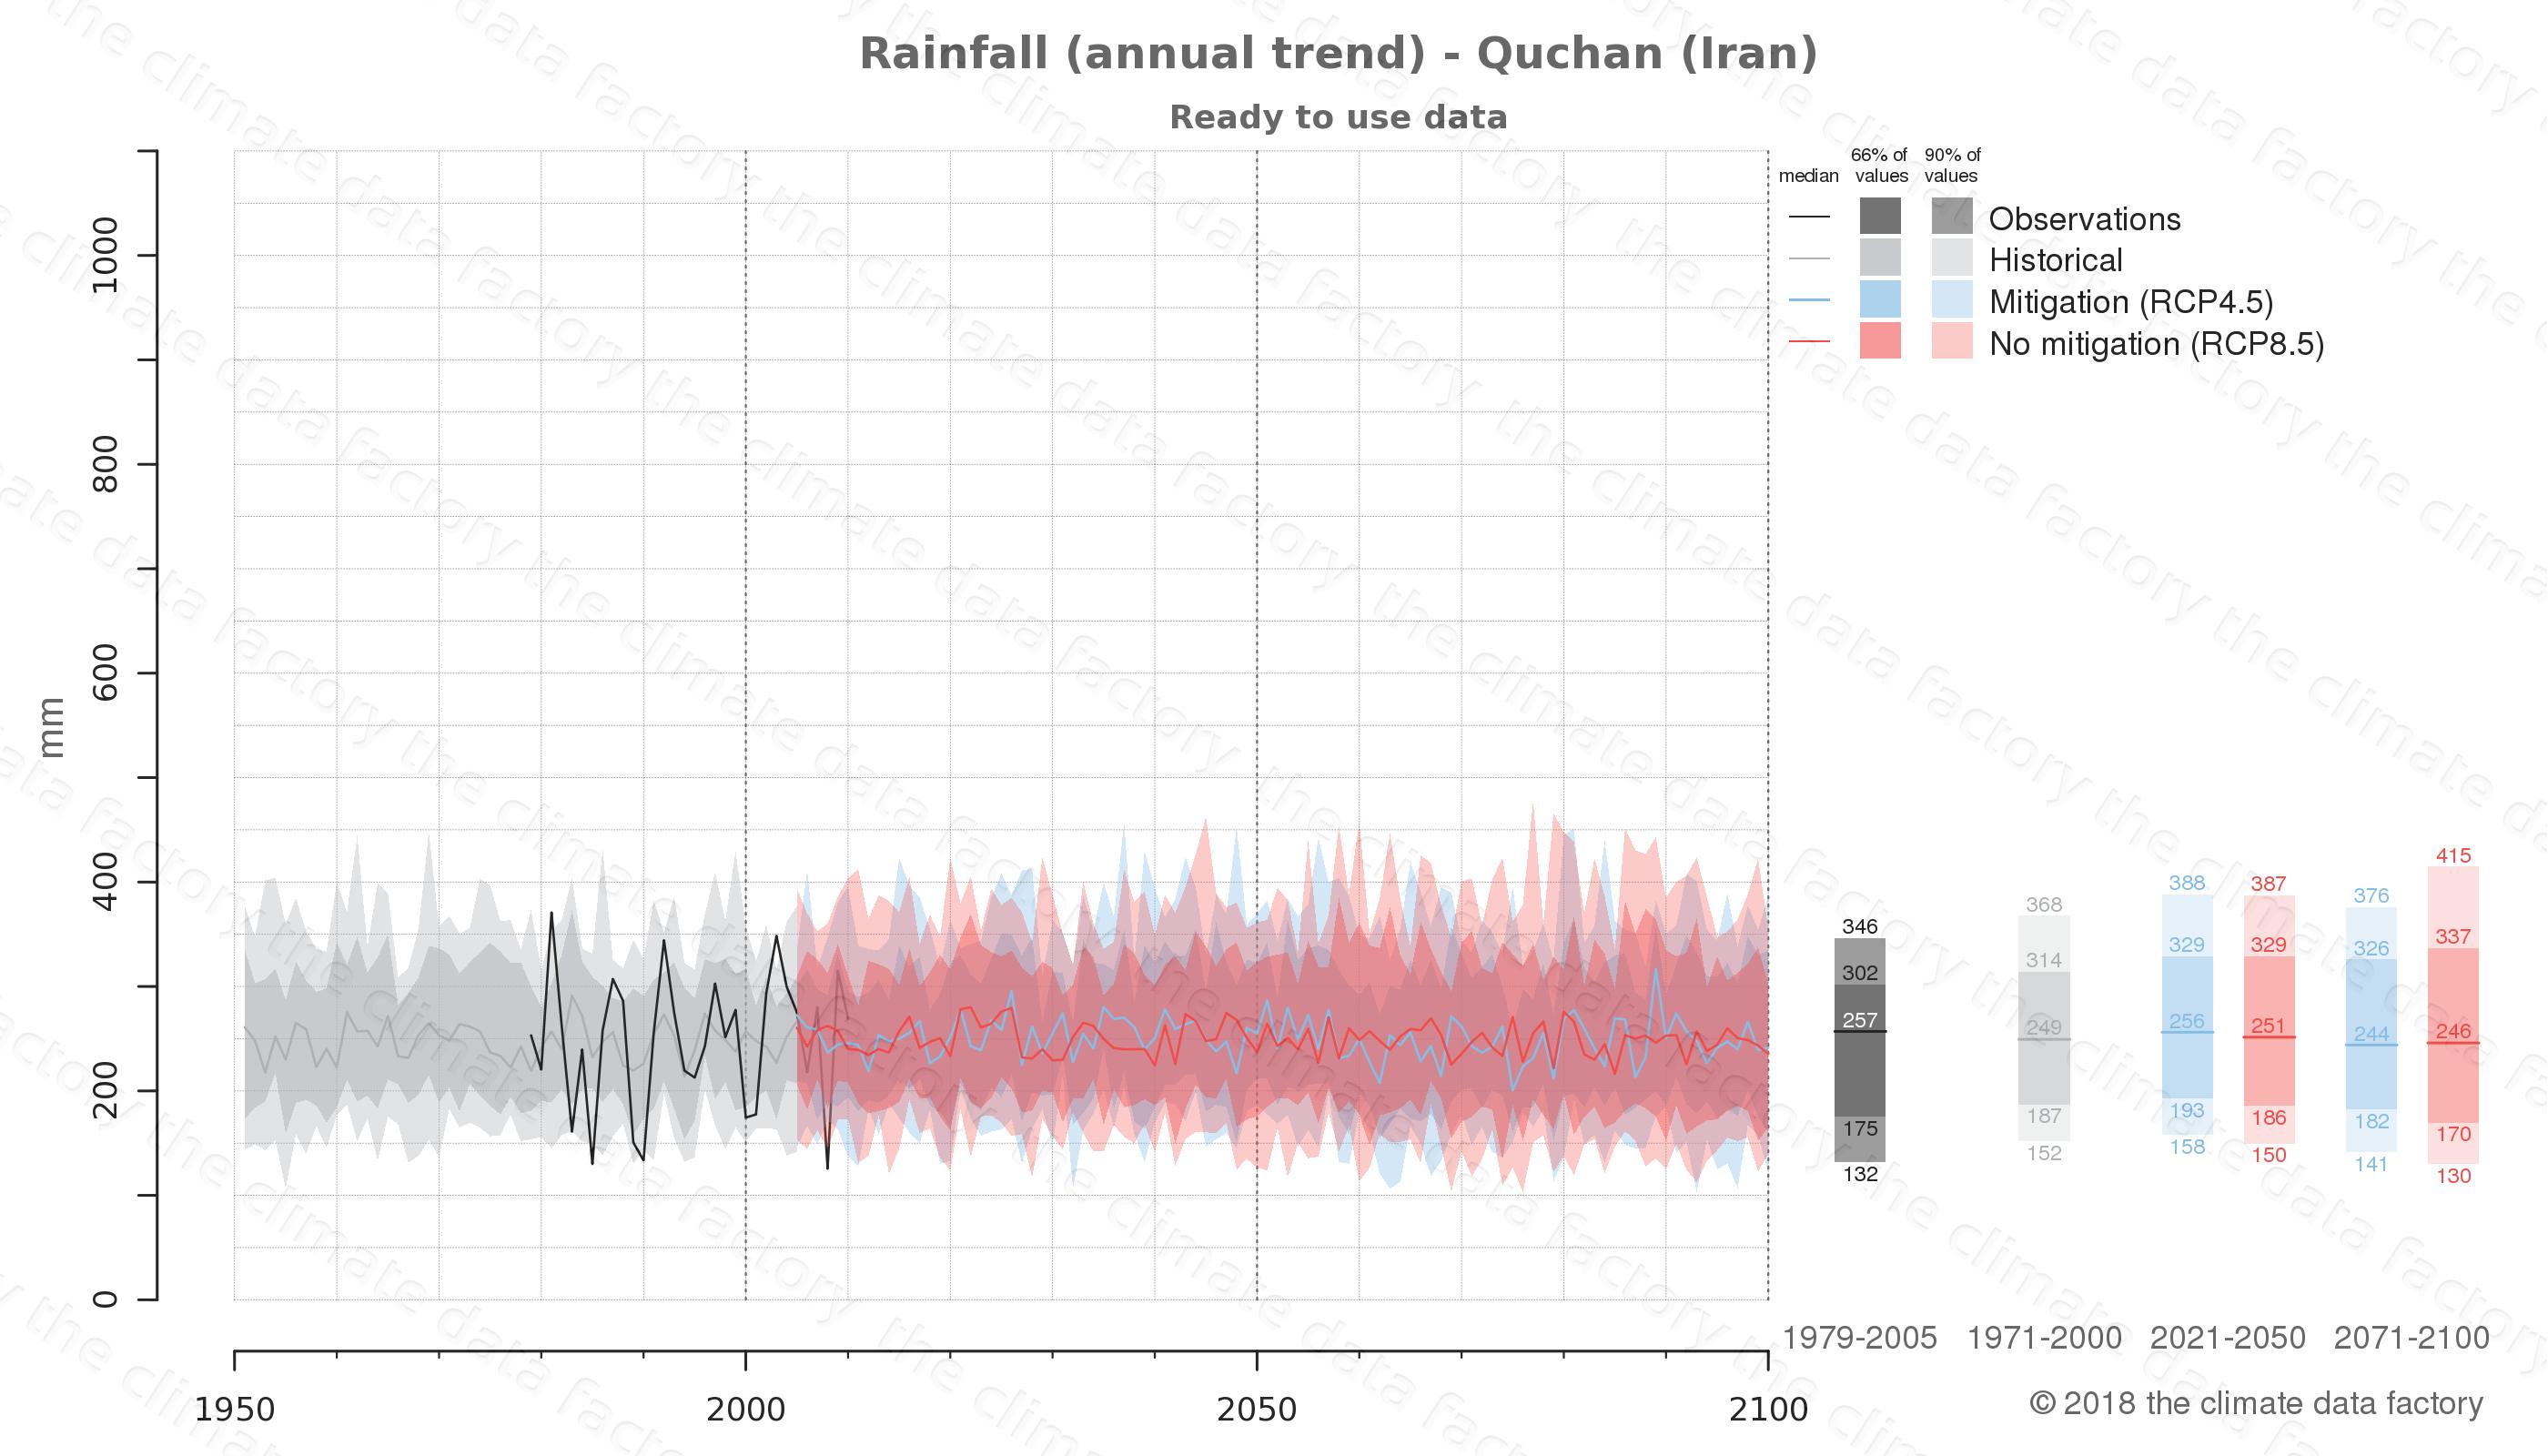 climate change data policy adaptation climate graph city data rainfall quchan iran